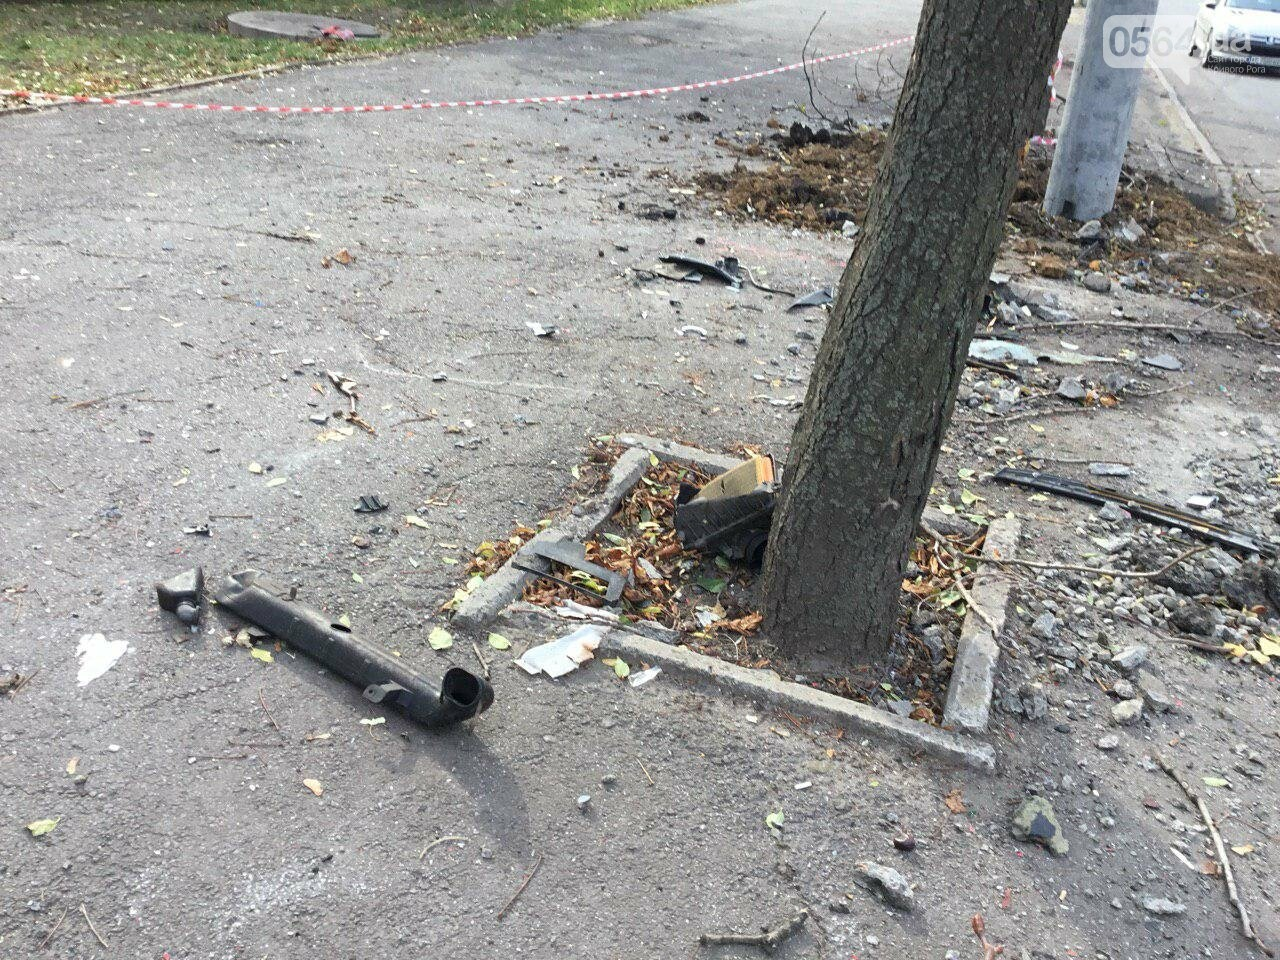 Куски стекла и обшивки разбившейся в Кривом Роге иномарки разлетелись на десятки метров, - ФОТО, фото-22